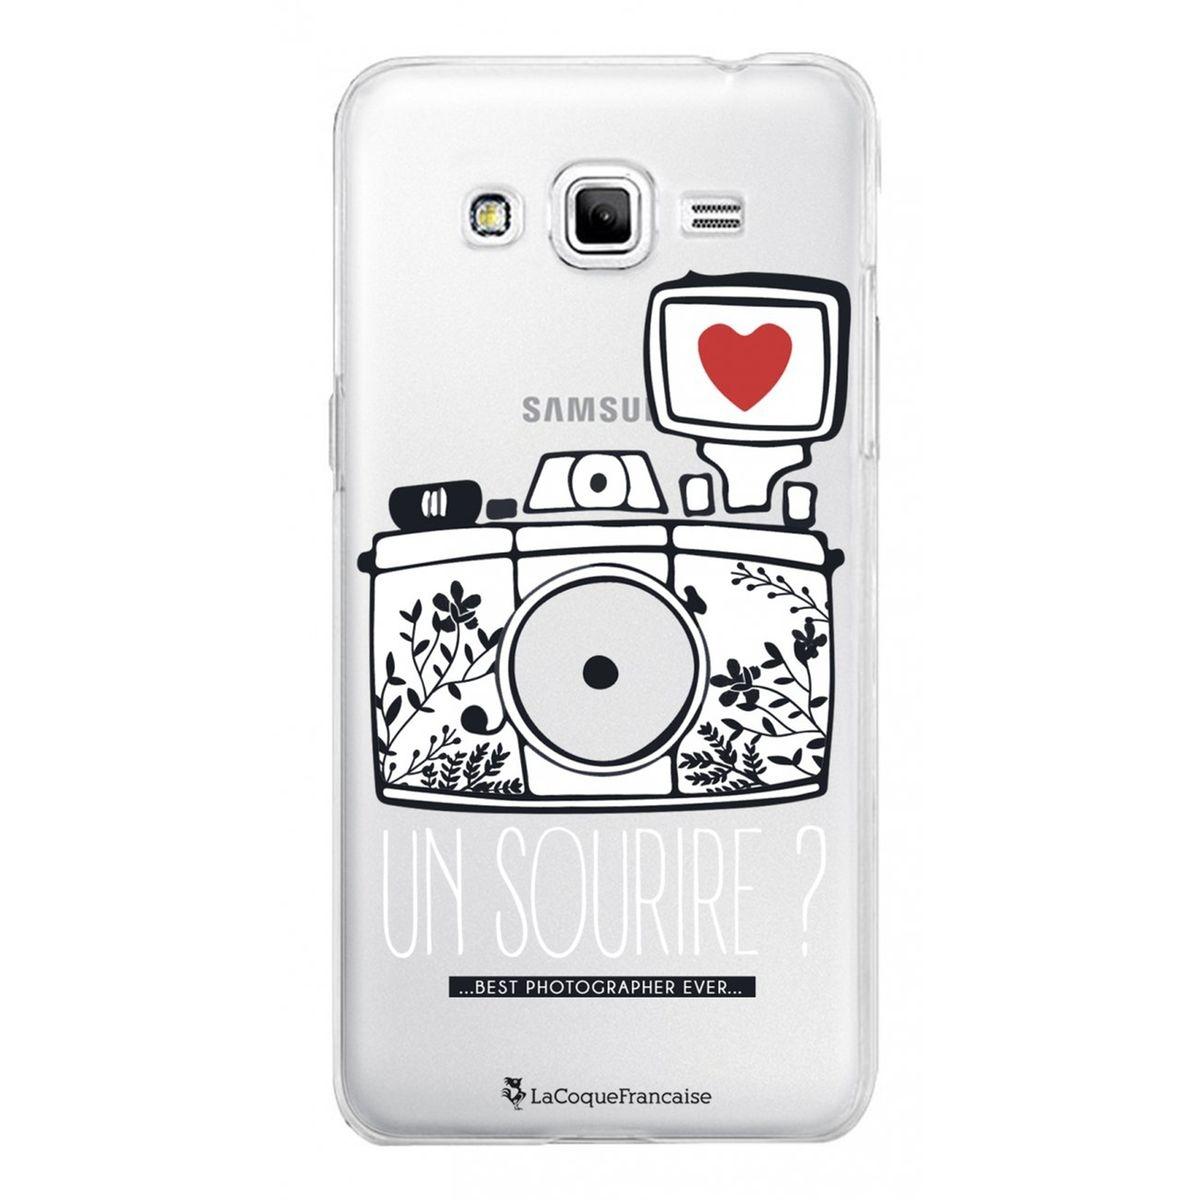 Coque Samsung Galaxy Grand Prime rigide transparente, Un sourire, La Coque Francaise®